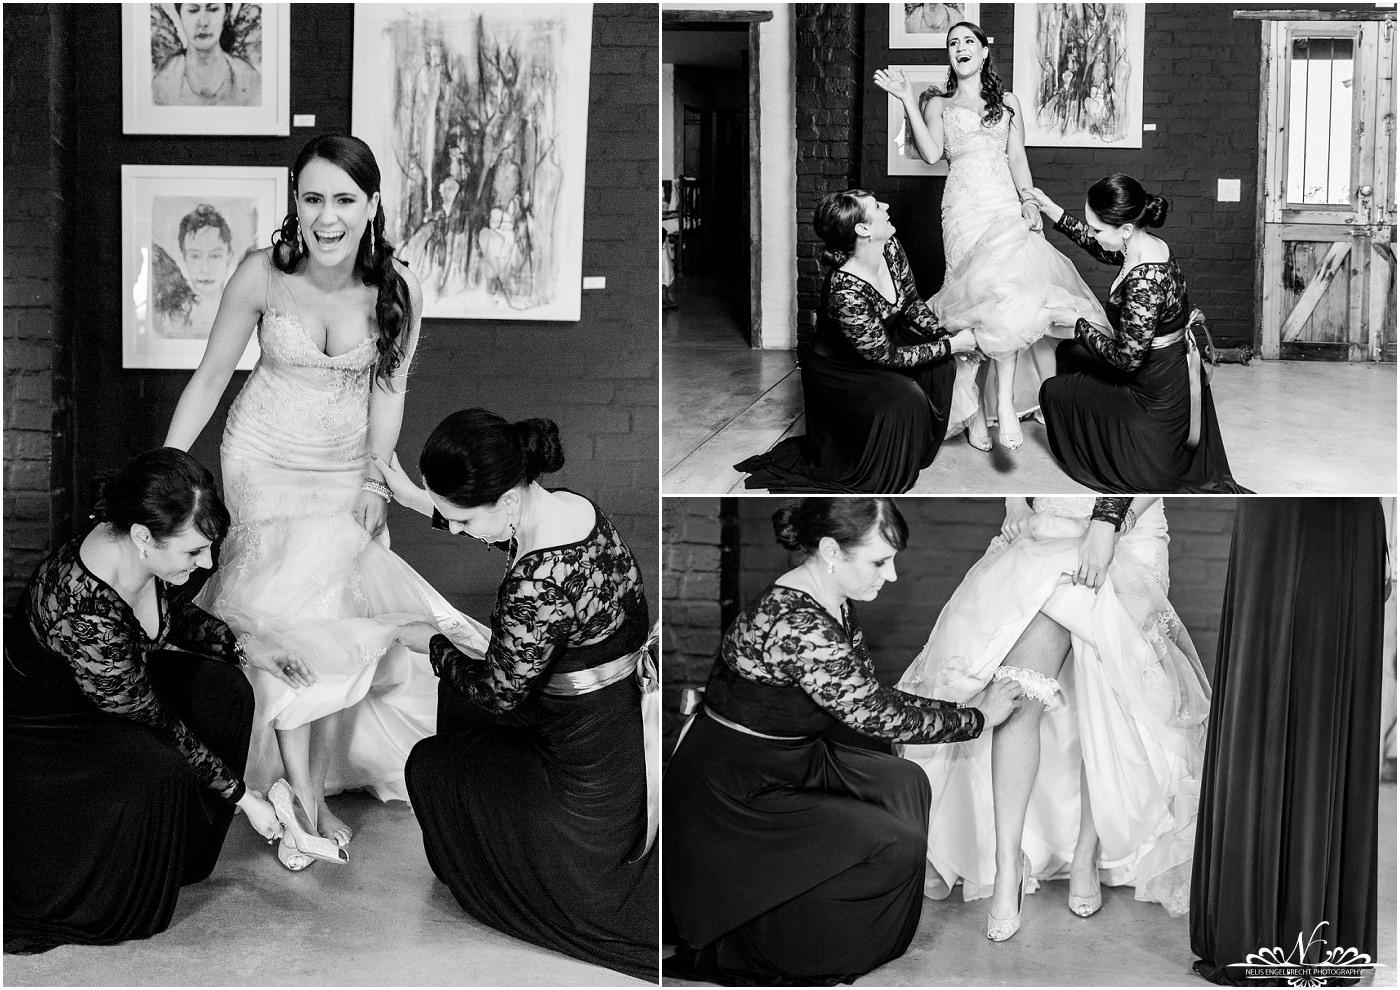 Eensgezind-Wedding-Photos-Nelis-Engelbrecht-Photography-037